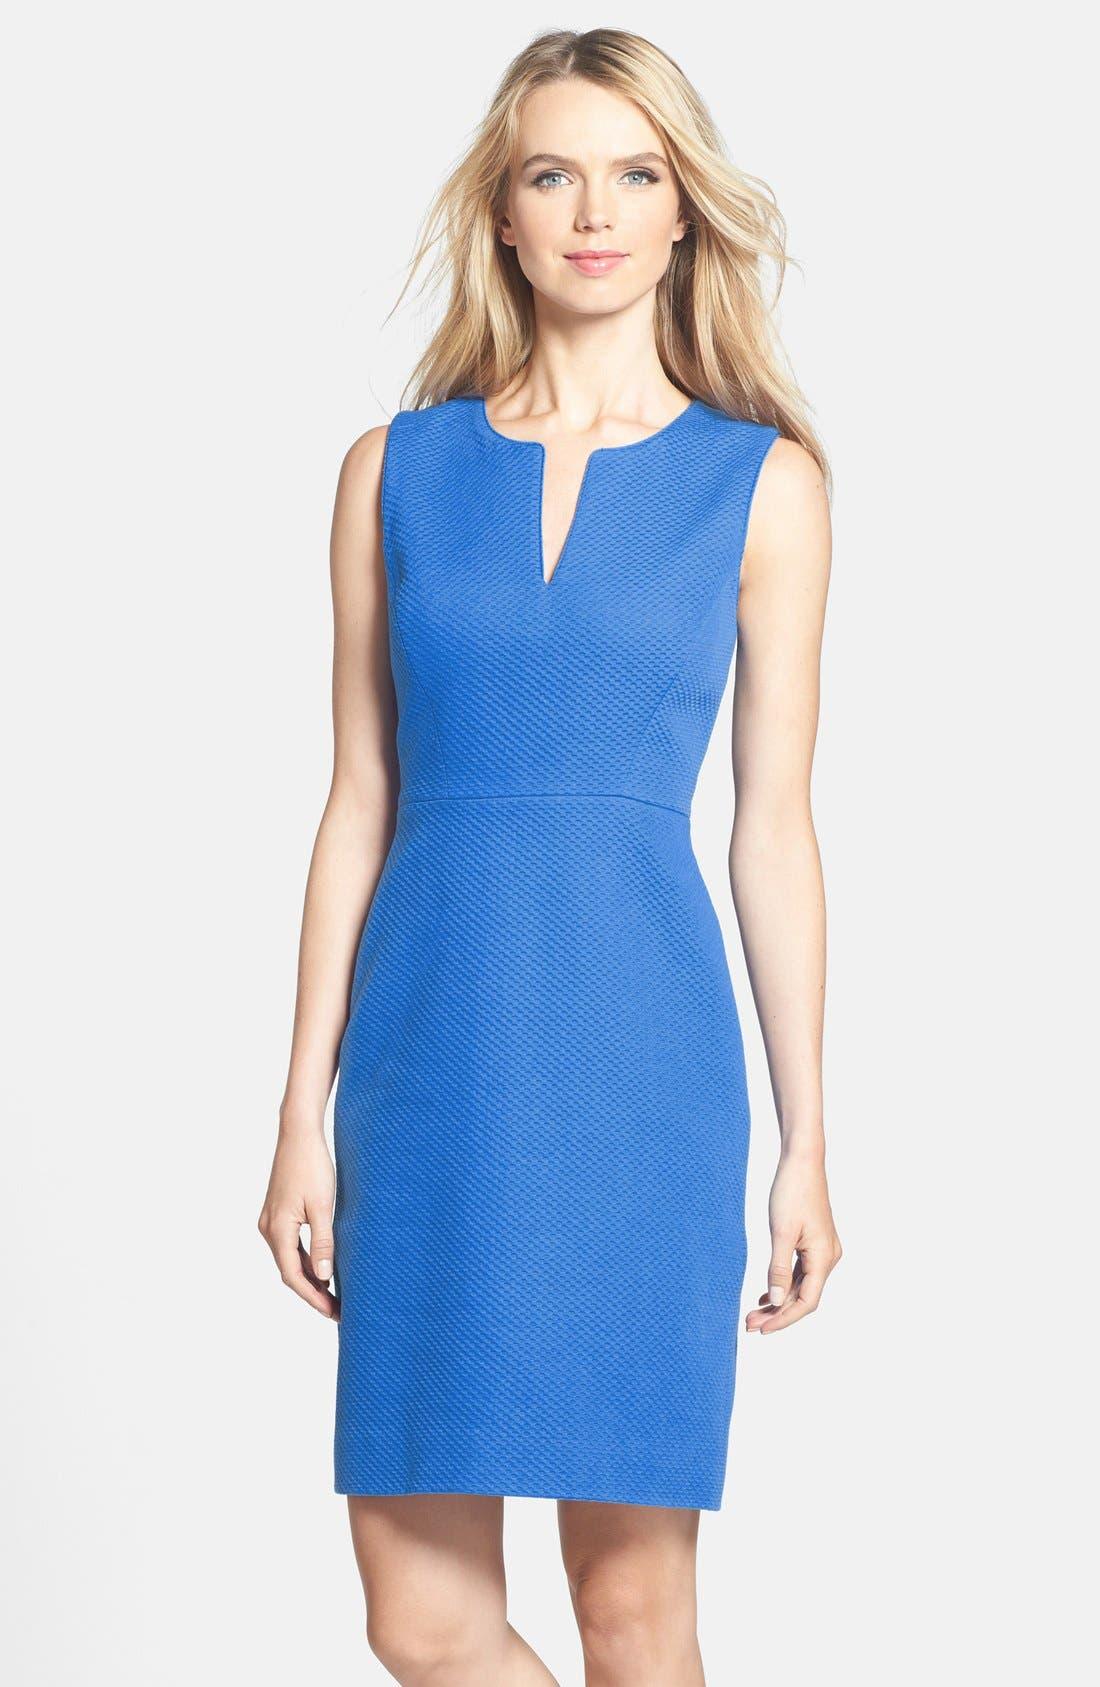 Alternate Image 1 Selected - kate spade new york 'emrick' cotton sheath dress